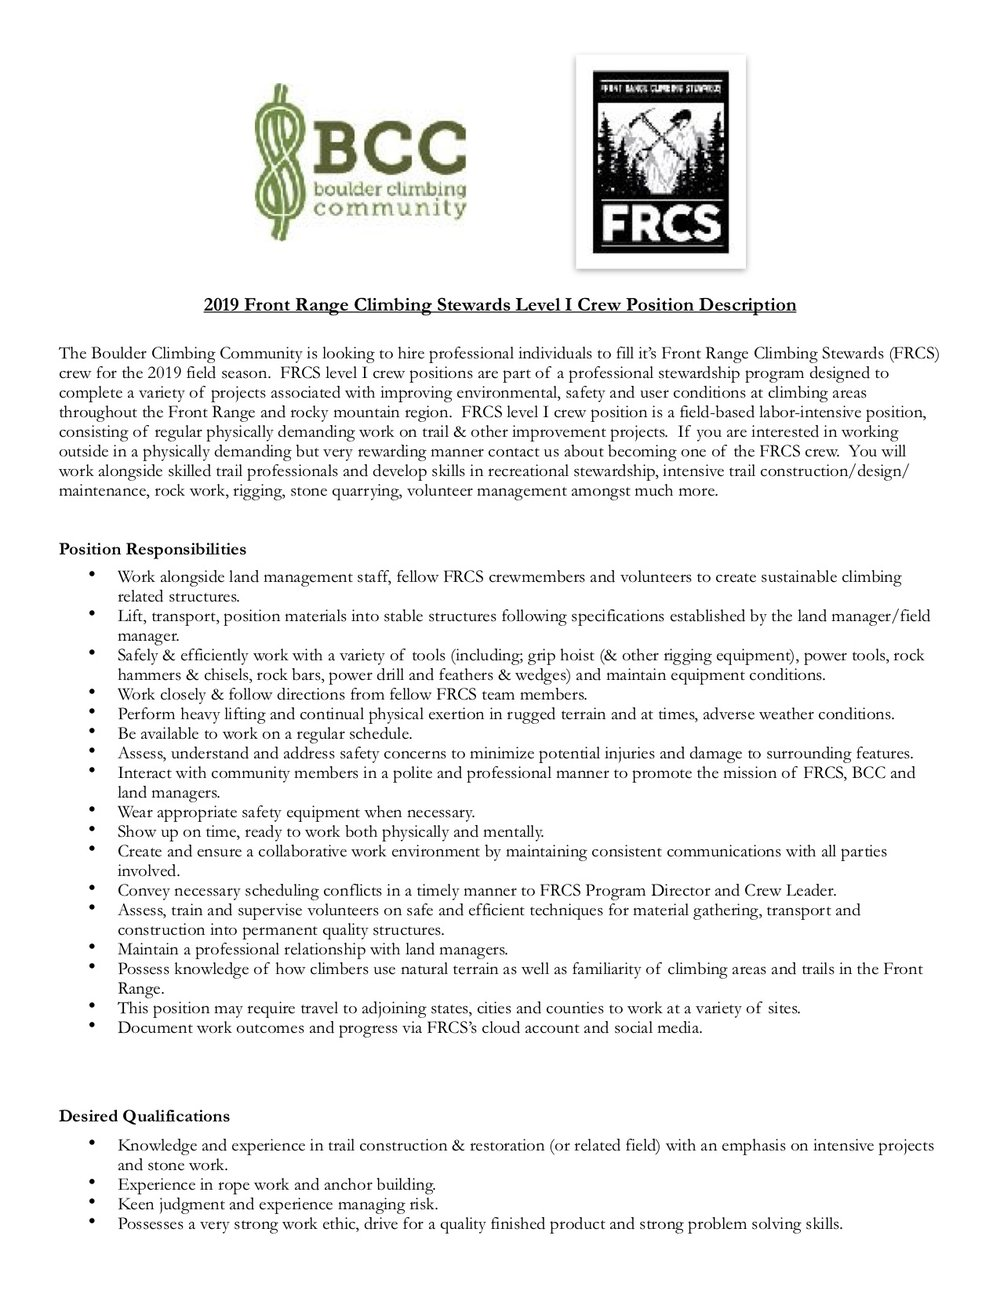 2019 FRCS Level I crew position description.jpg